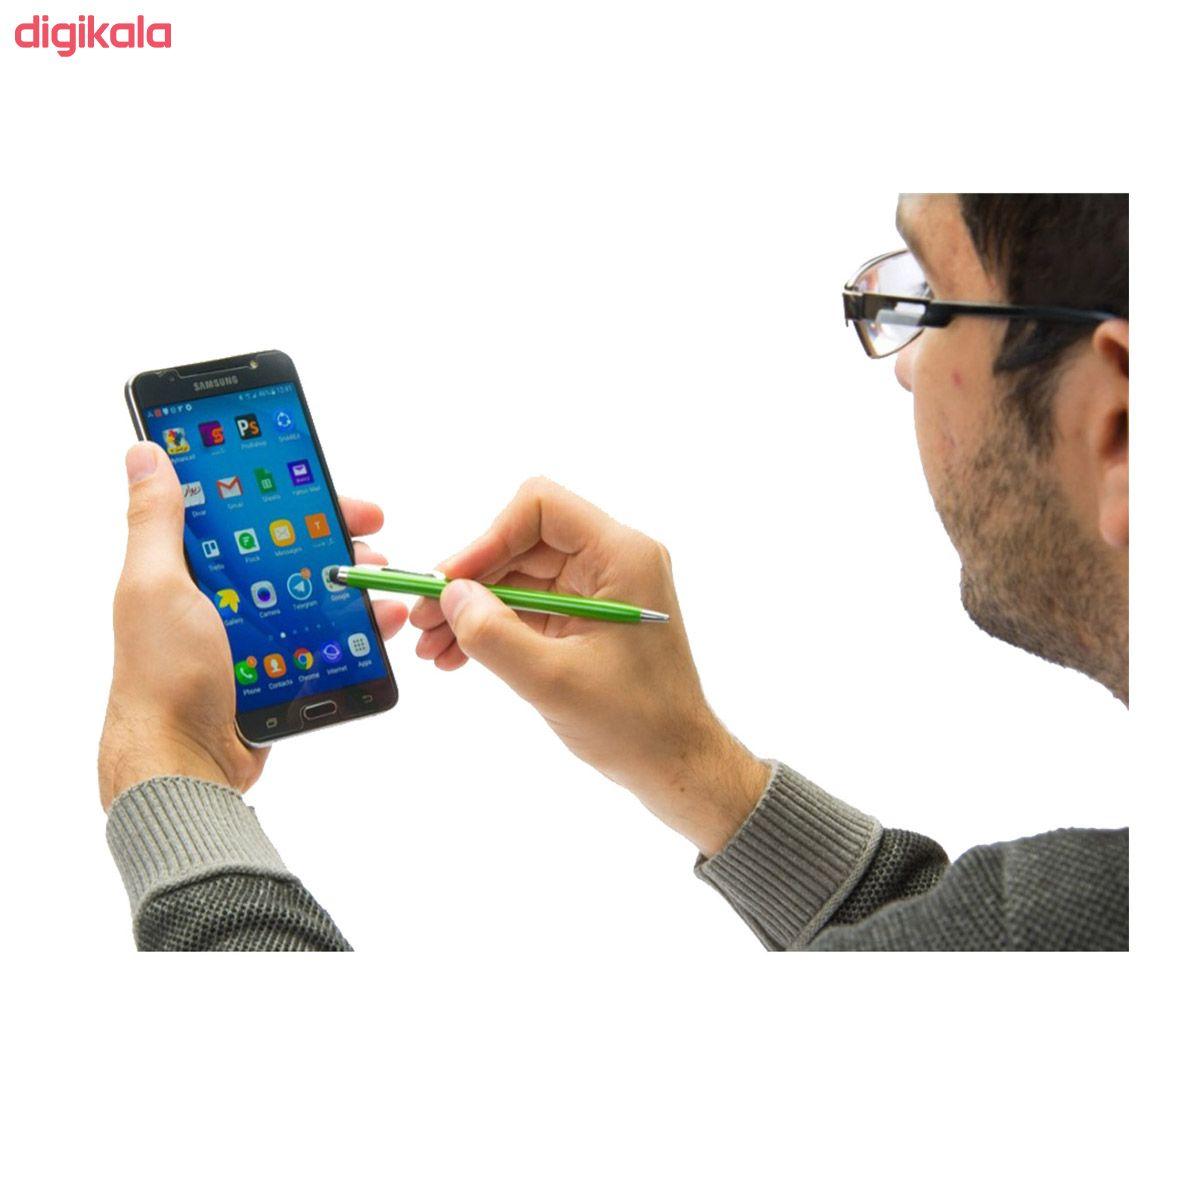 قلم لمسی کد SQMKZX02369 main 1 3